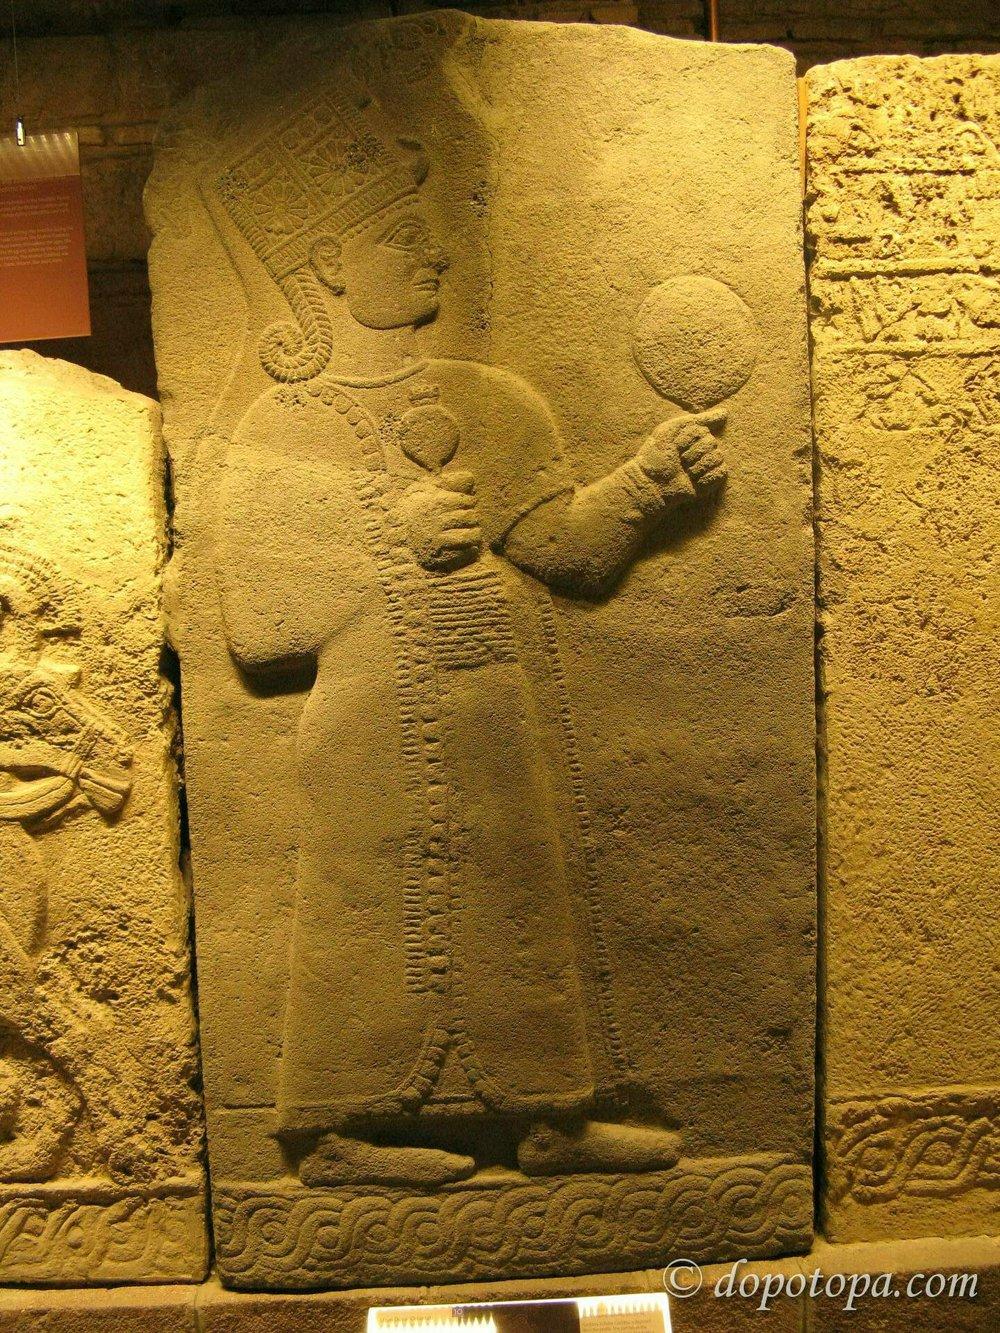 ankara_museum_stone_artefacts_13.JPG